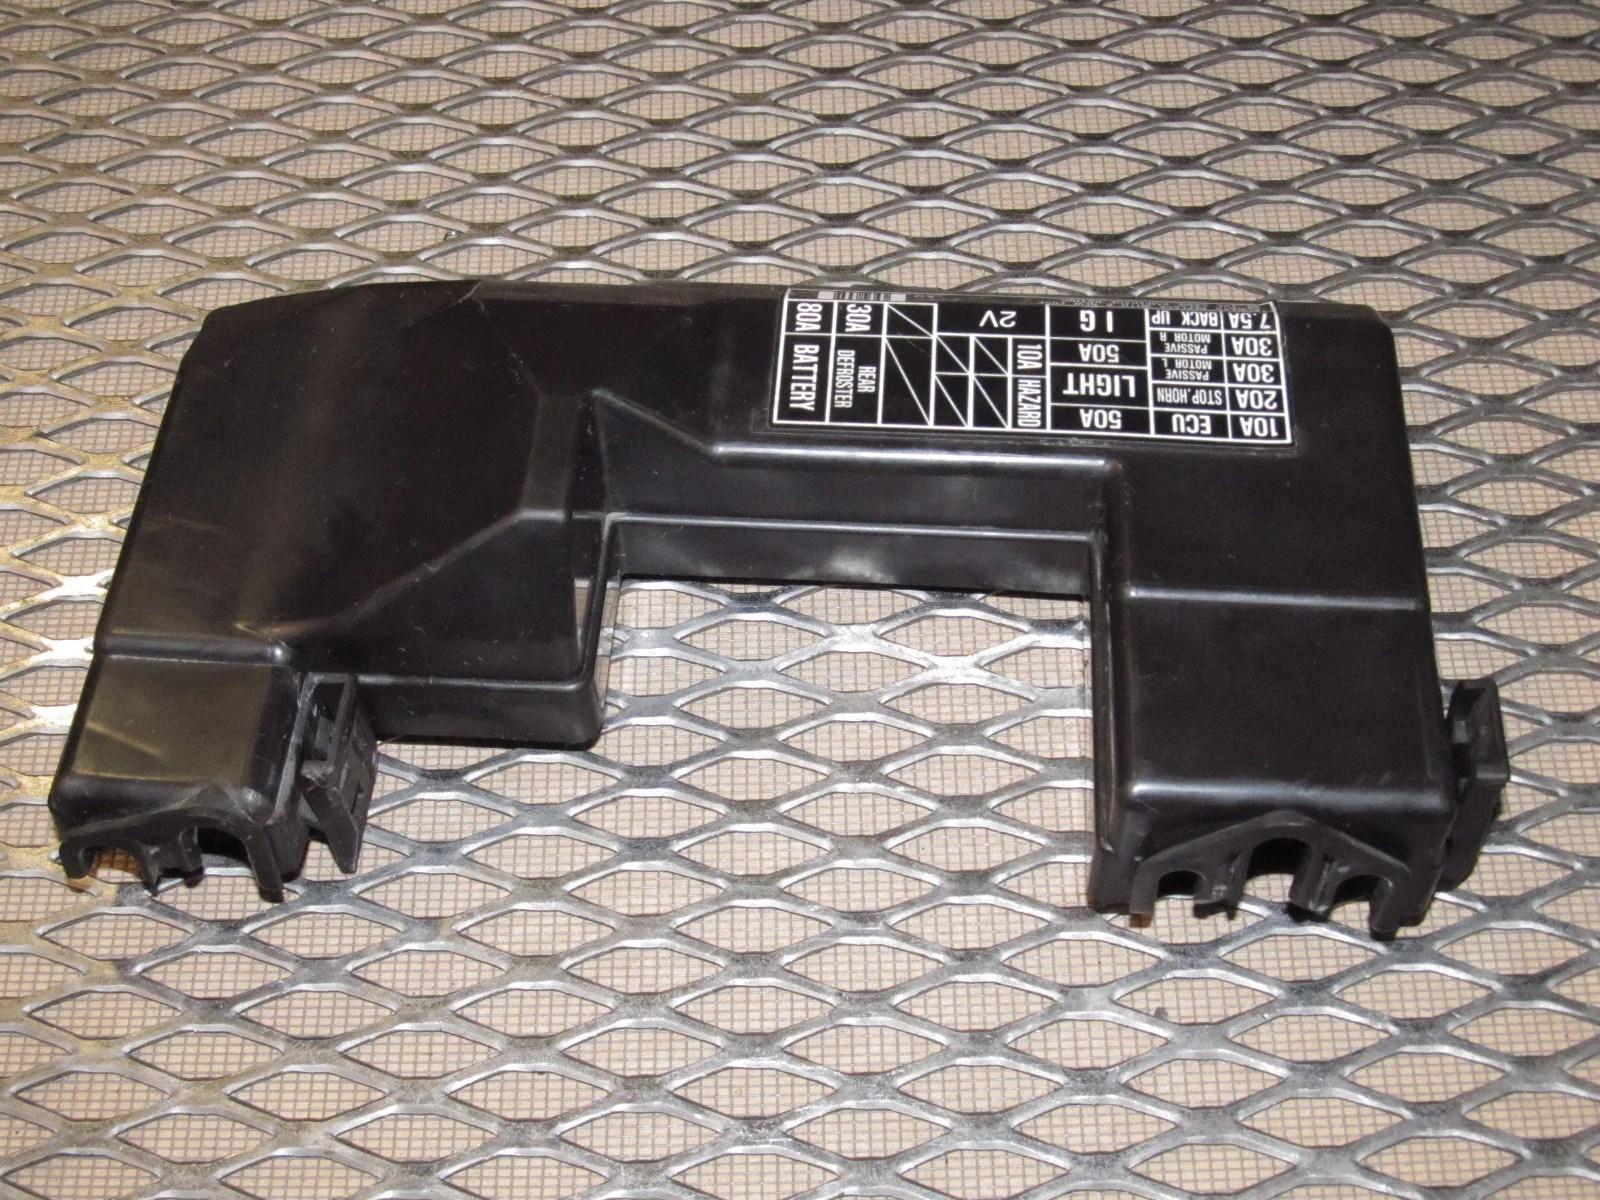 medium resolution of 90 93 integra fuse box wiring diagram technic1990 1993 integra fuse box 13